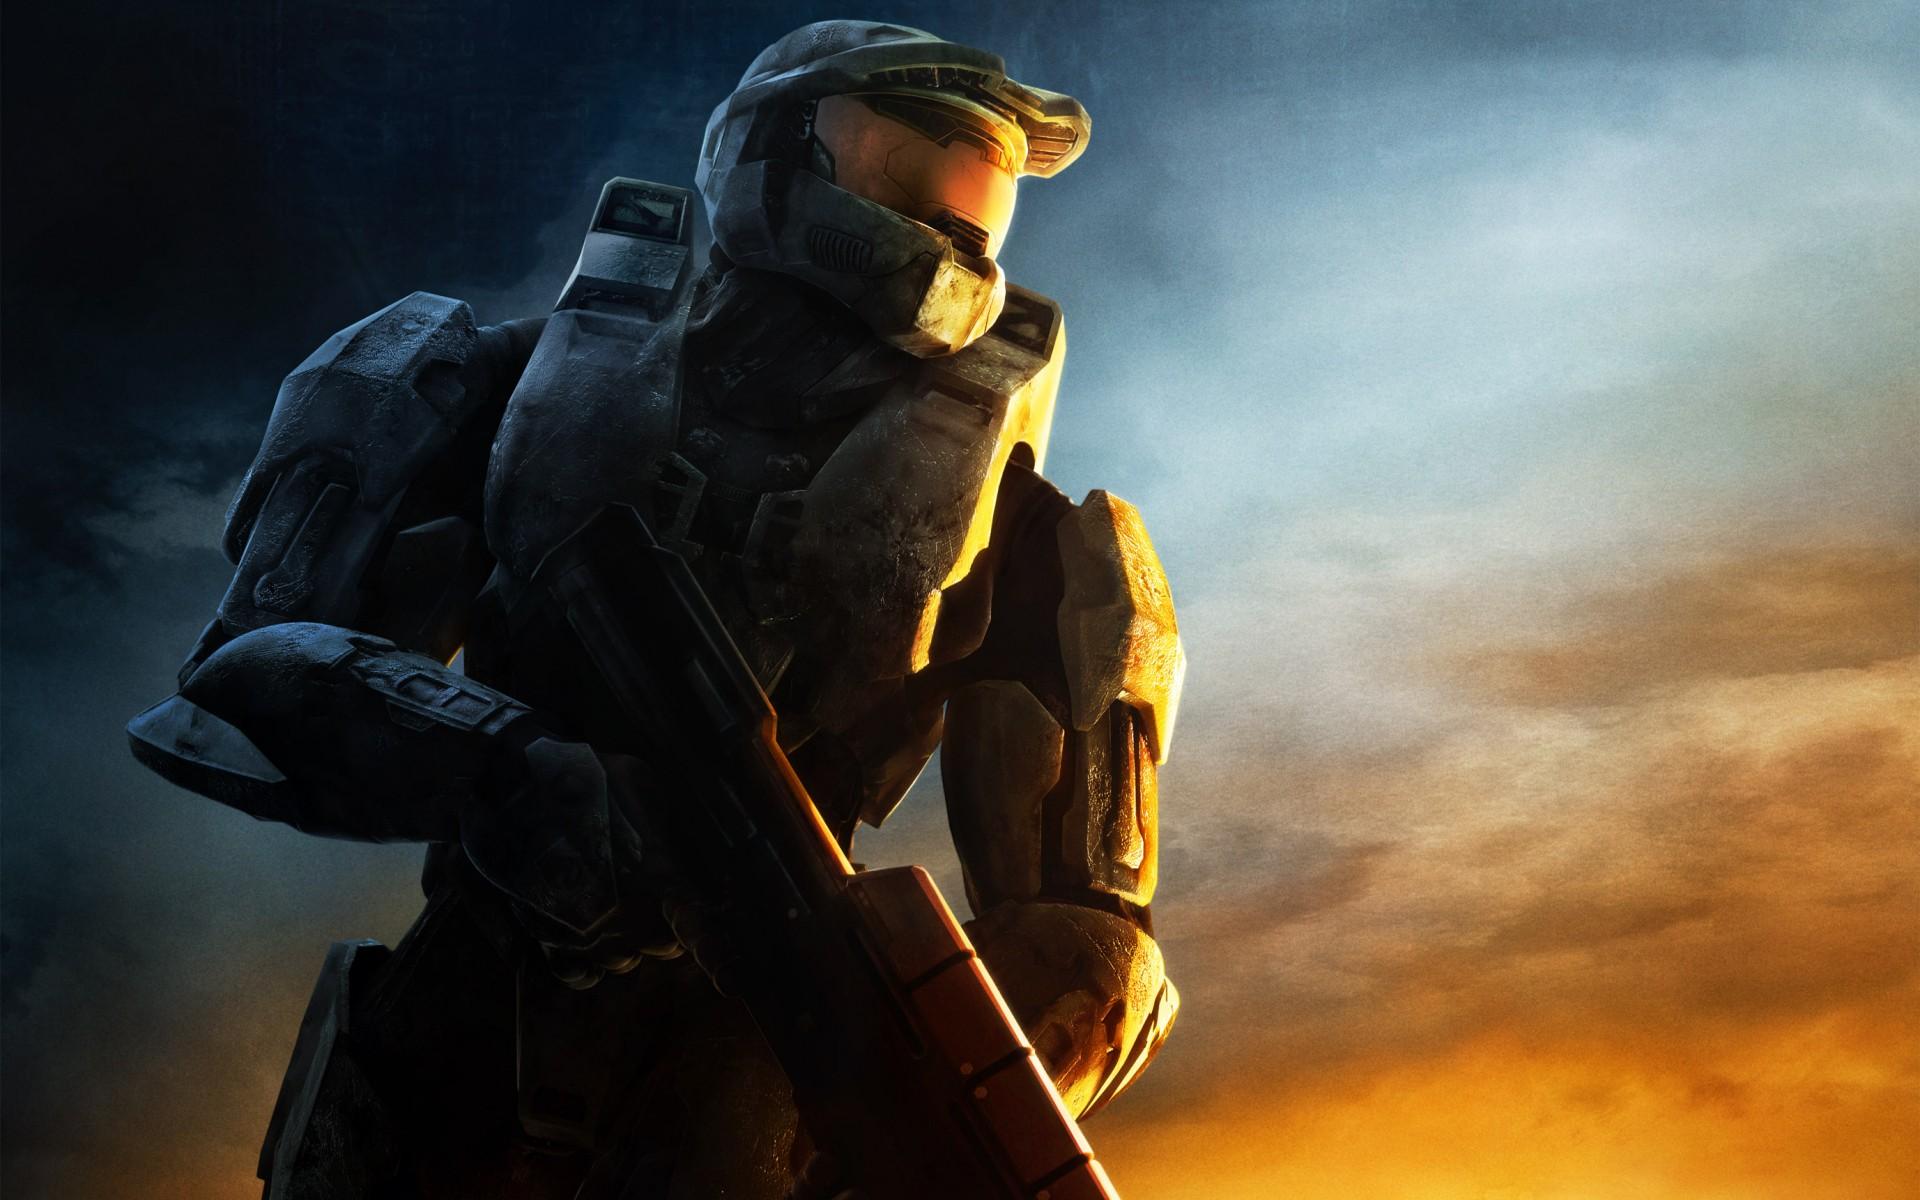 Wallpaper Video Games Master Chief Halo 3 Darkness